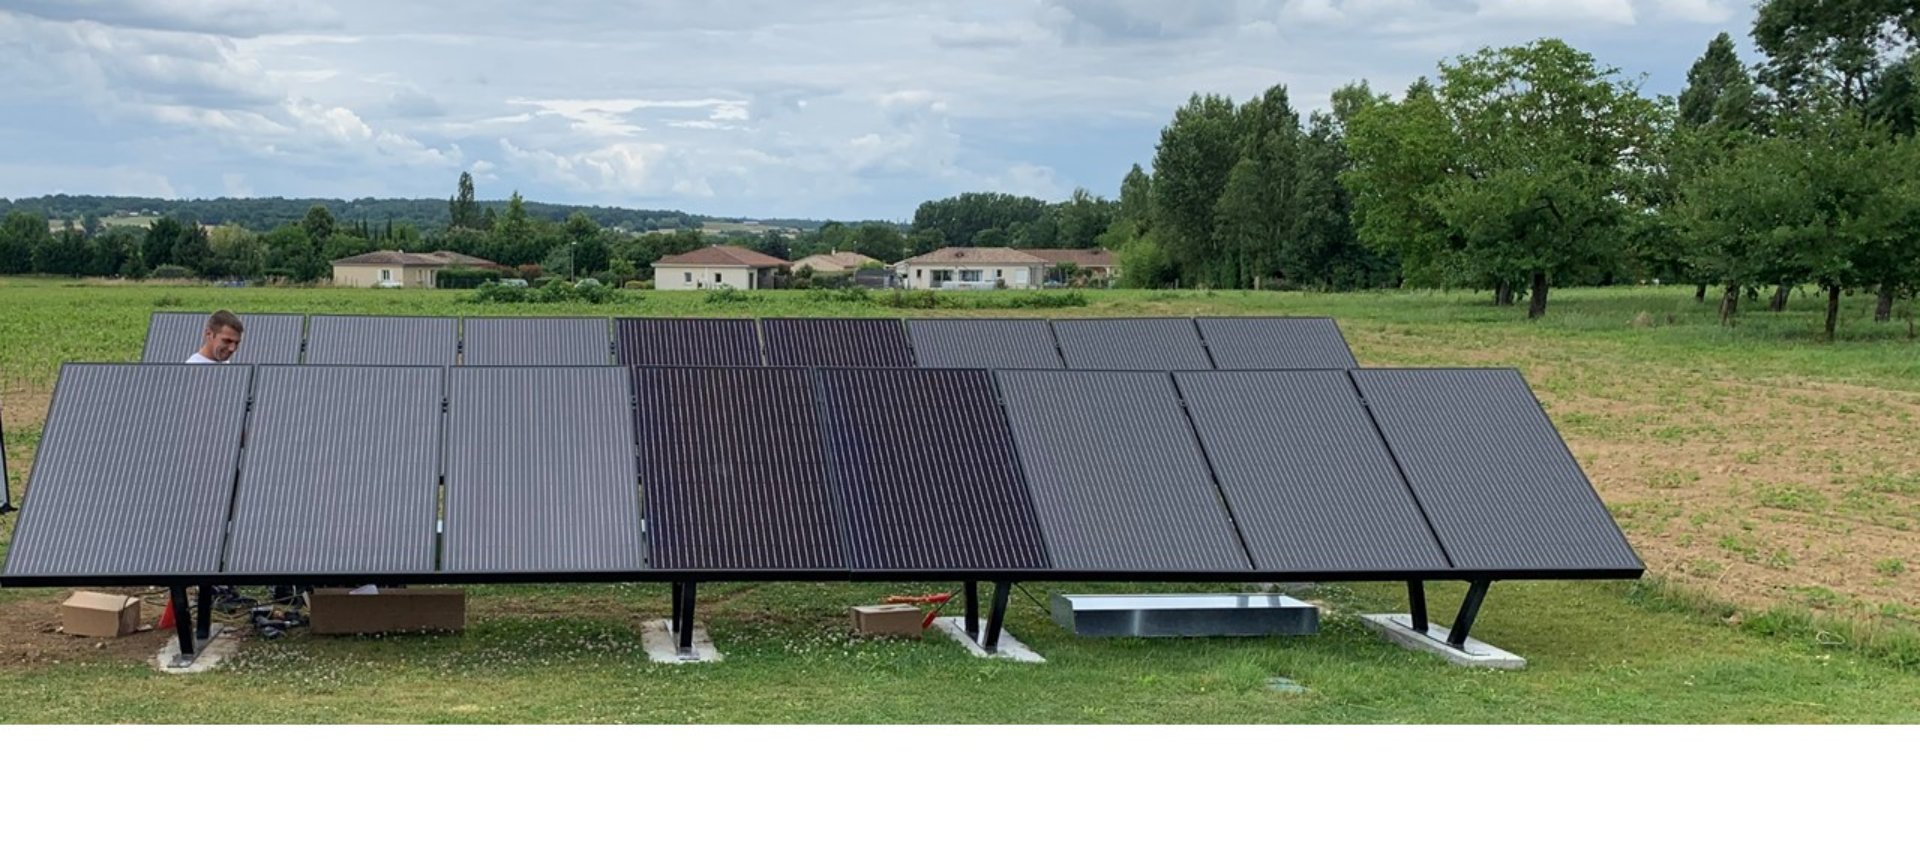 ENERGIES RENOUVELABLES: